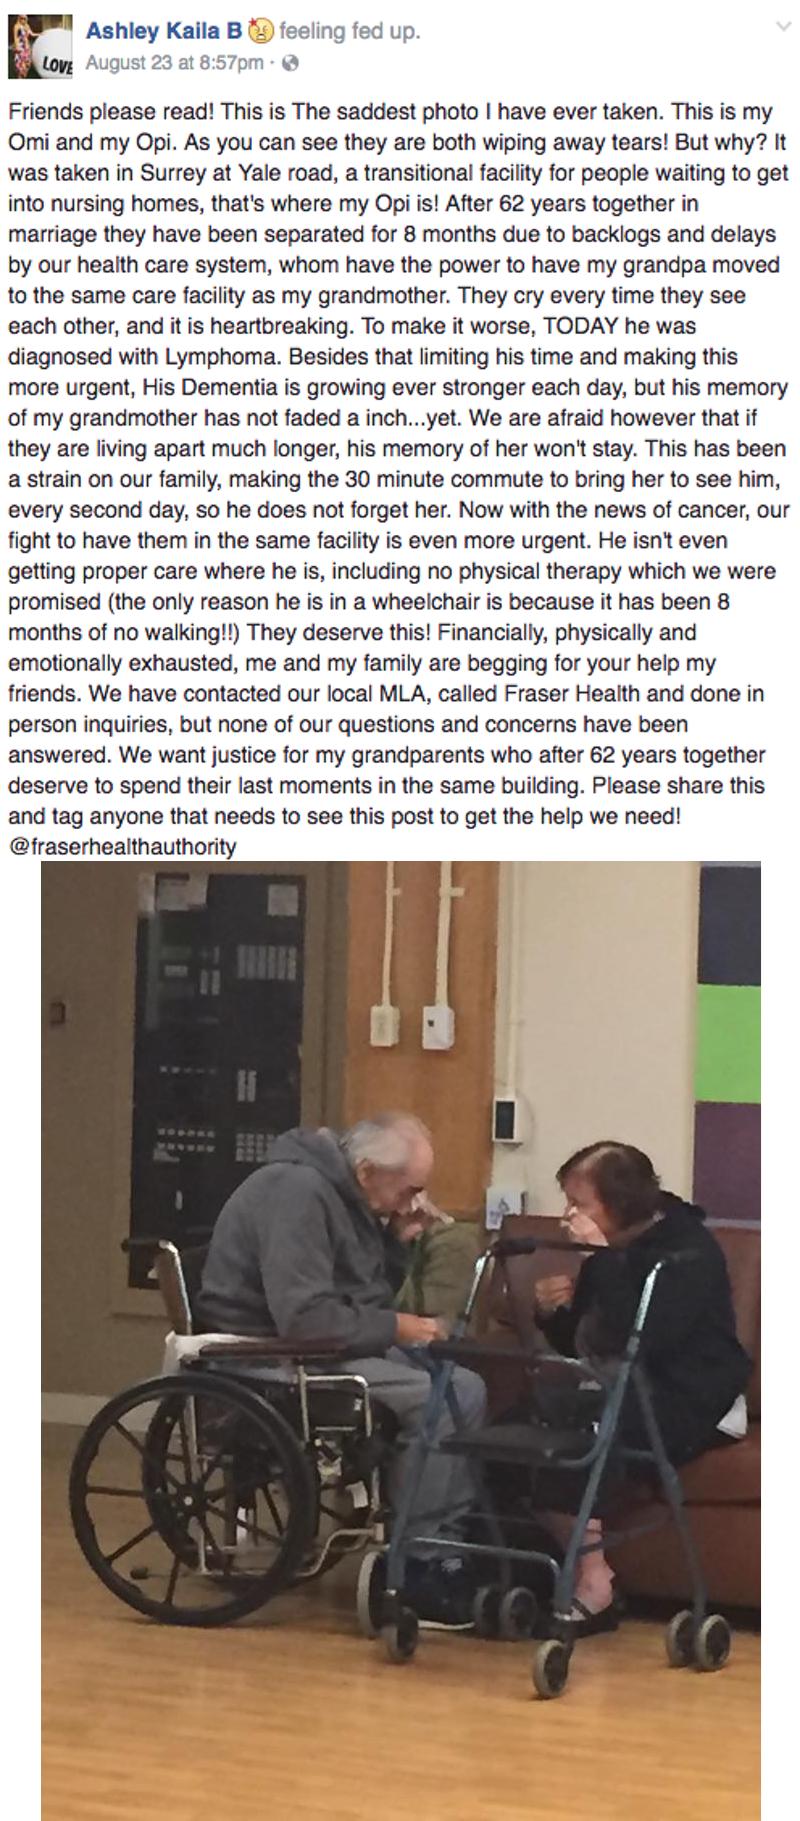 facebook love grandparents dating - 8971975680